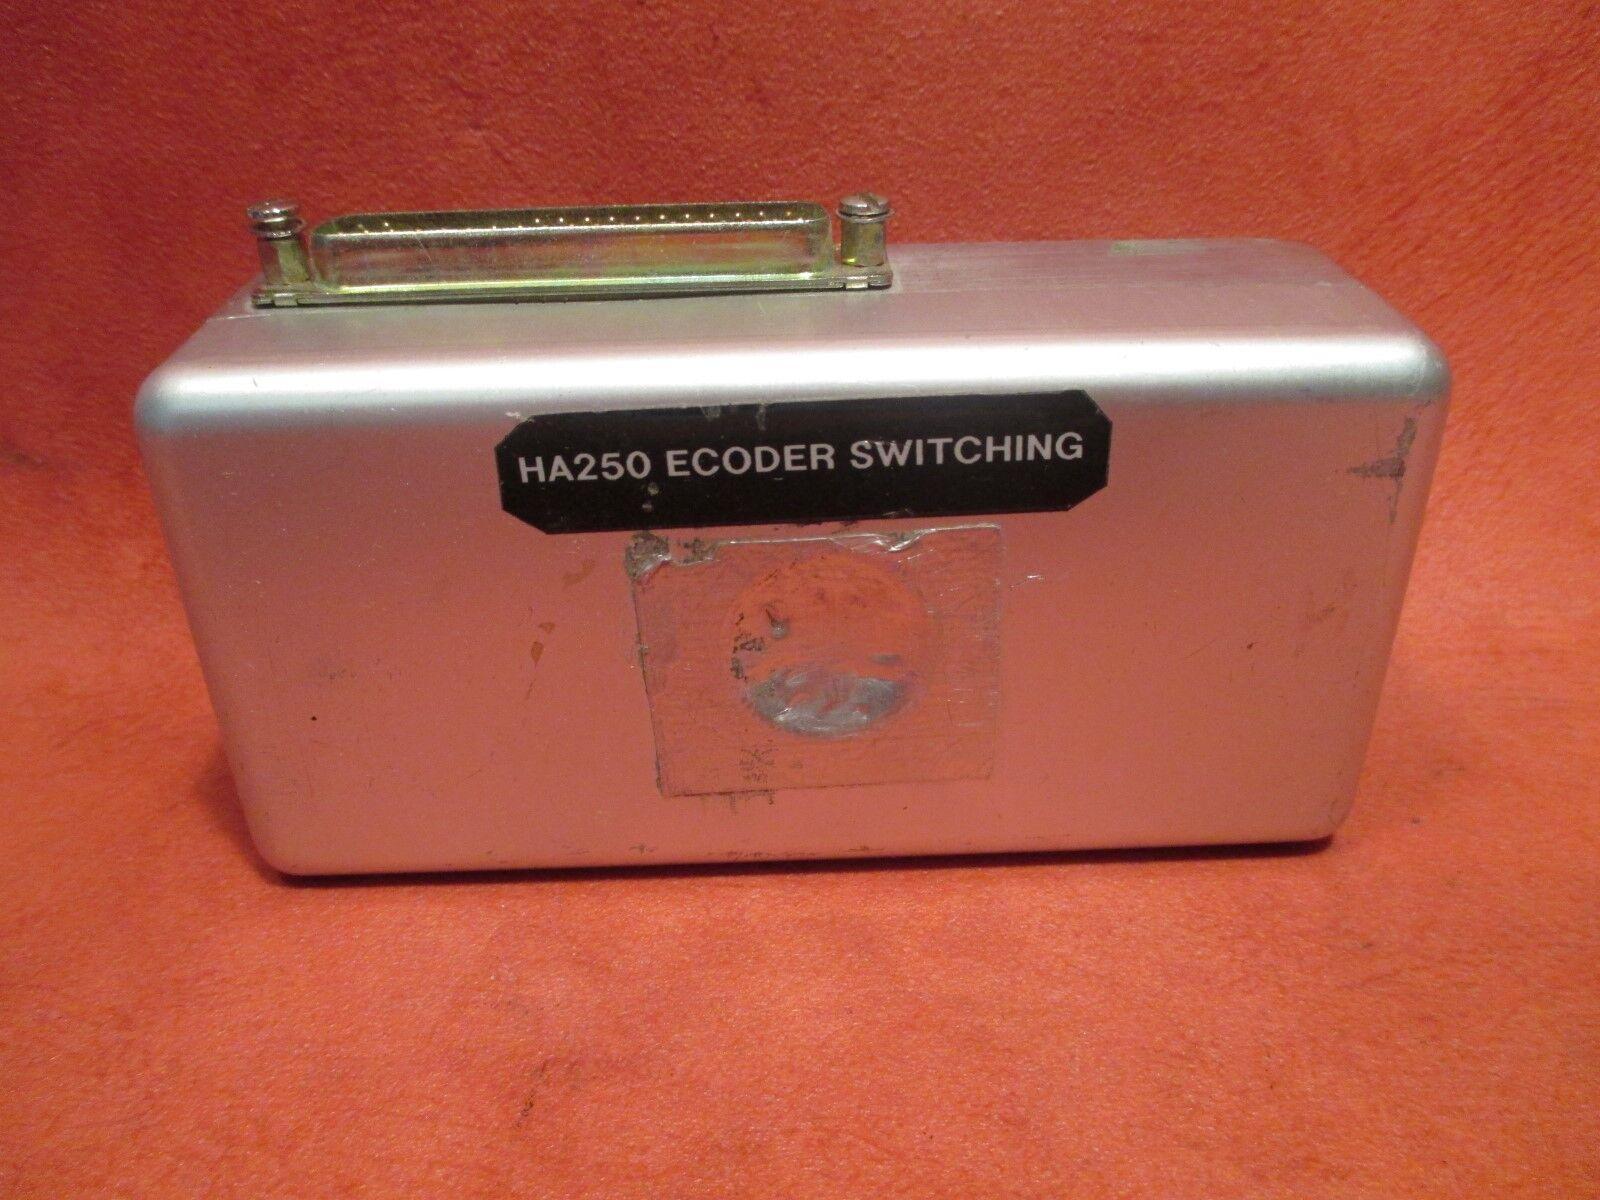 ACK Encoder Relay Box PN HA250